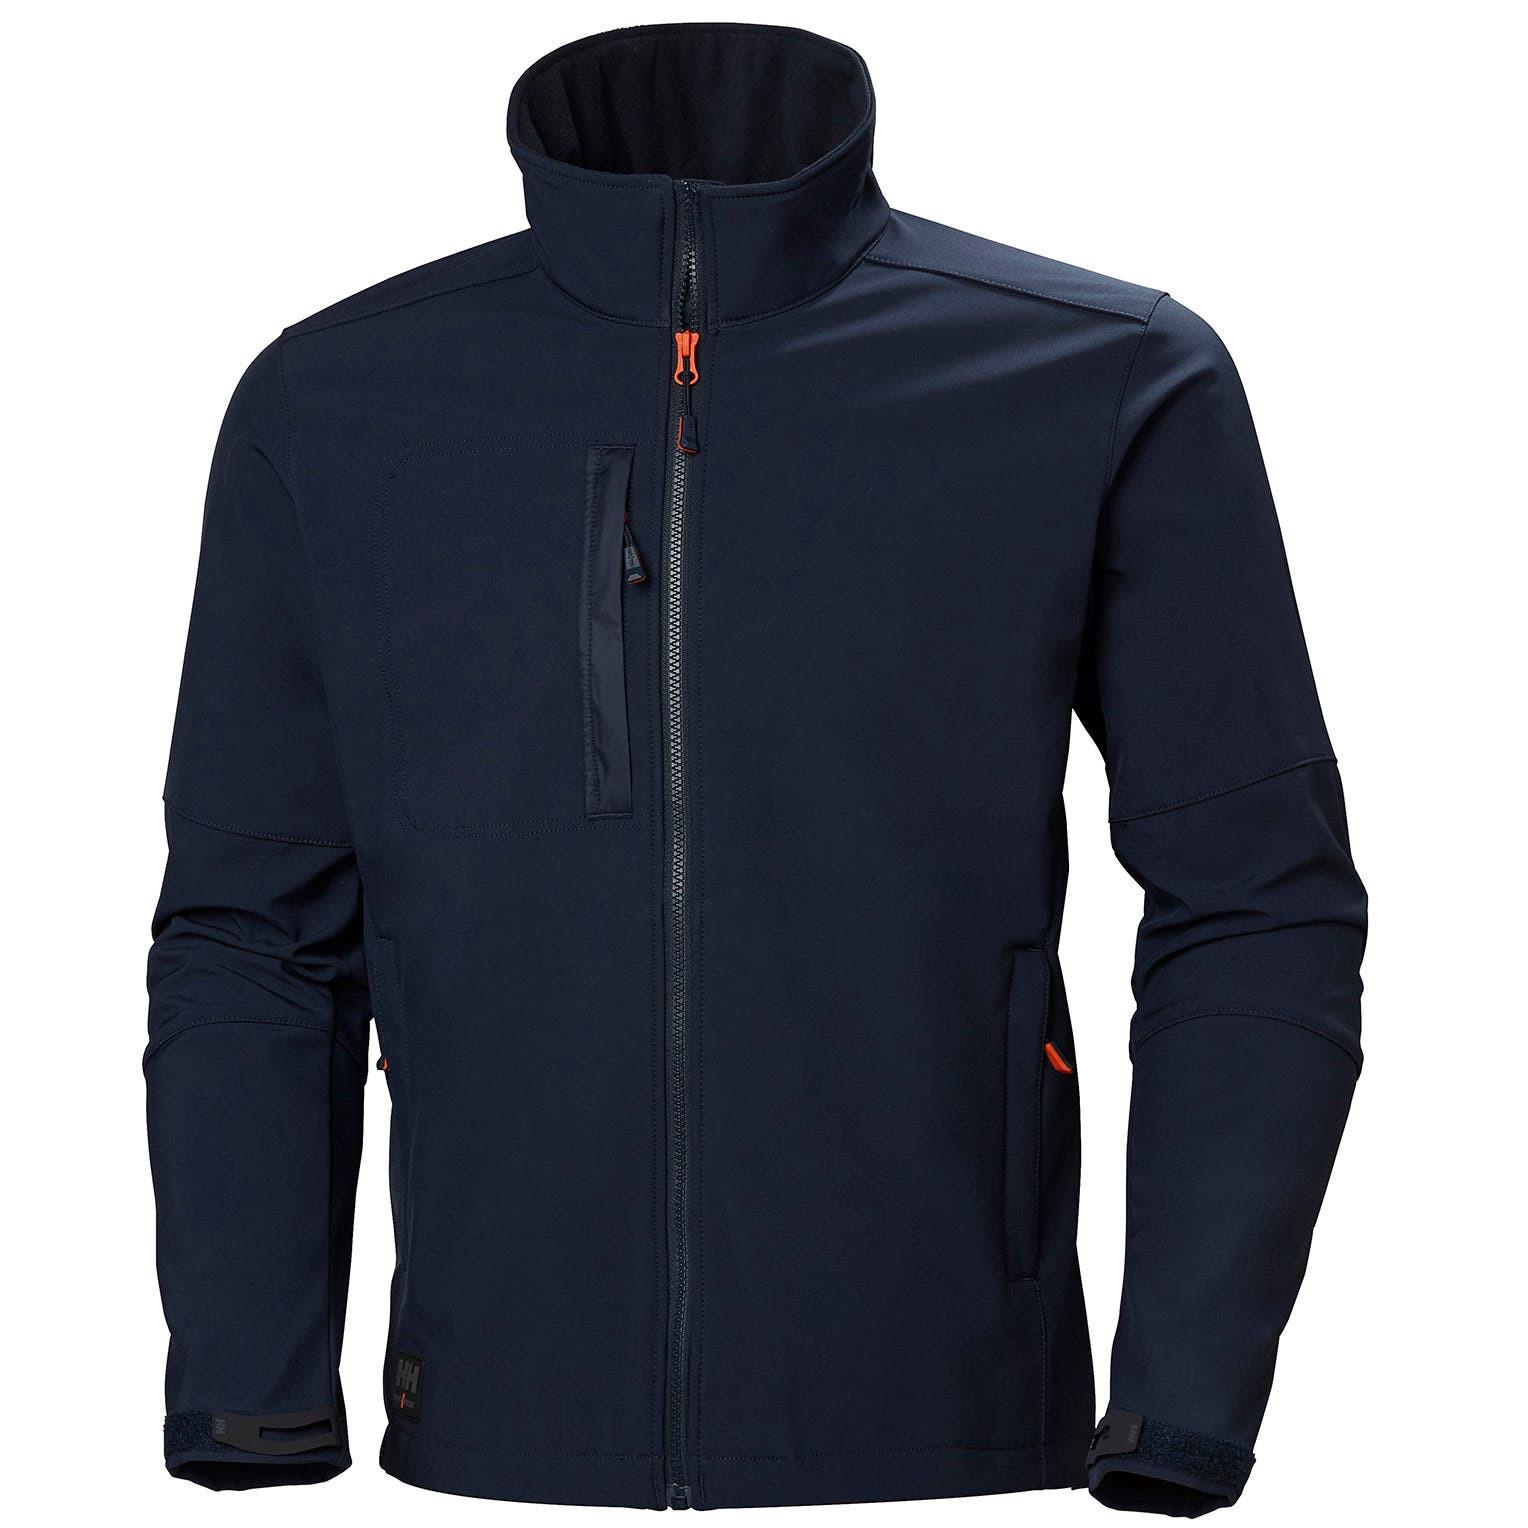 Куртка Helly Hansen Kensington Softshell Jacket - 74231 (Navy; S)